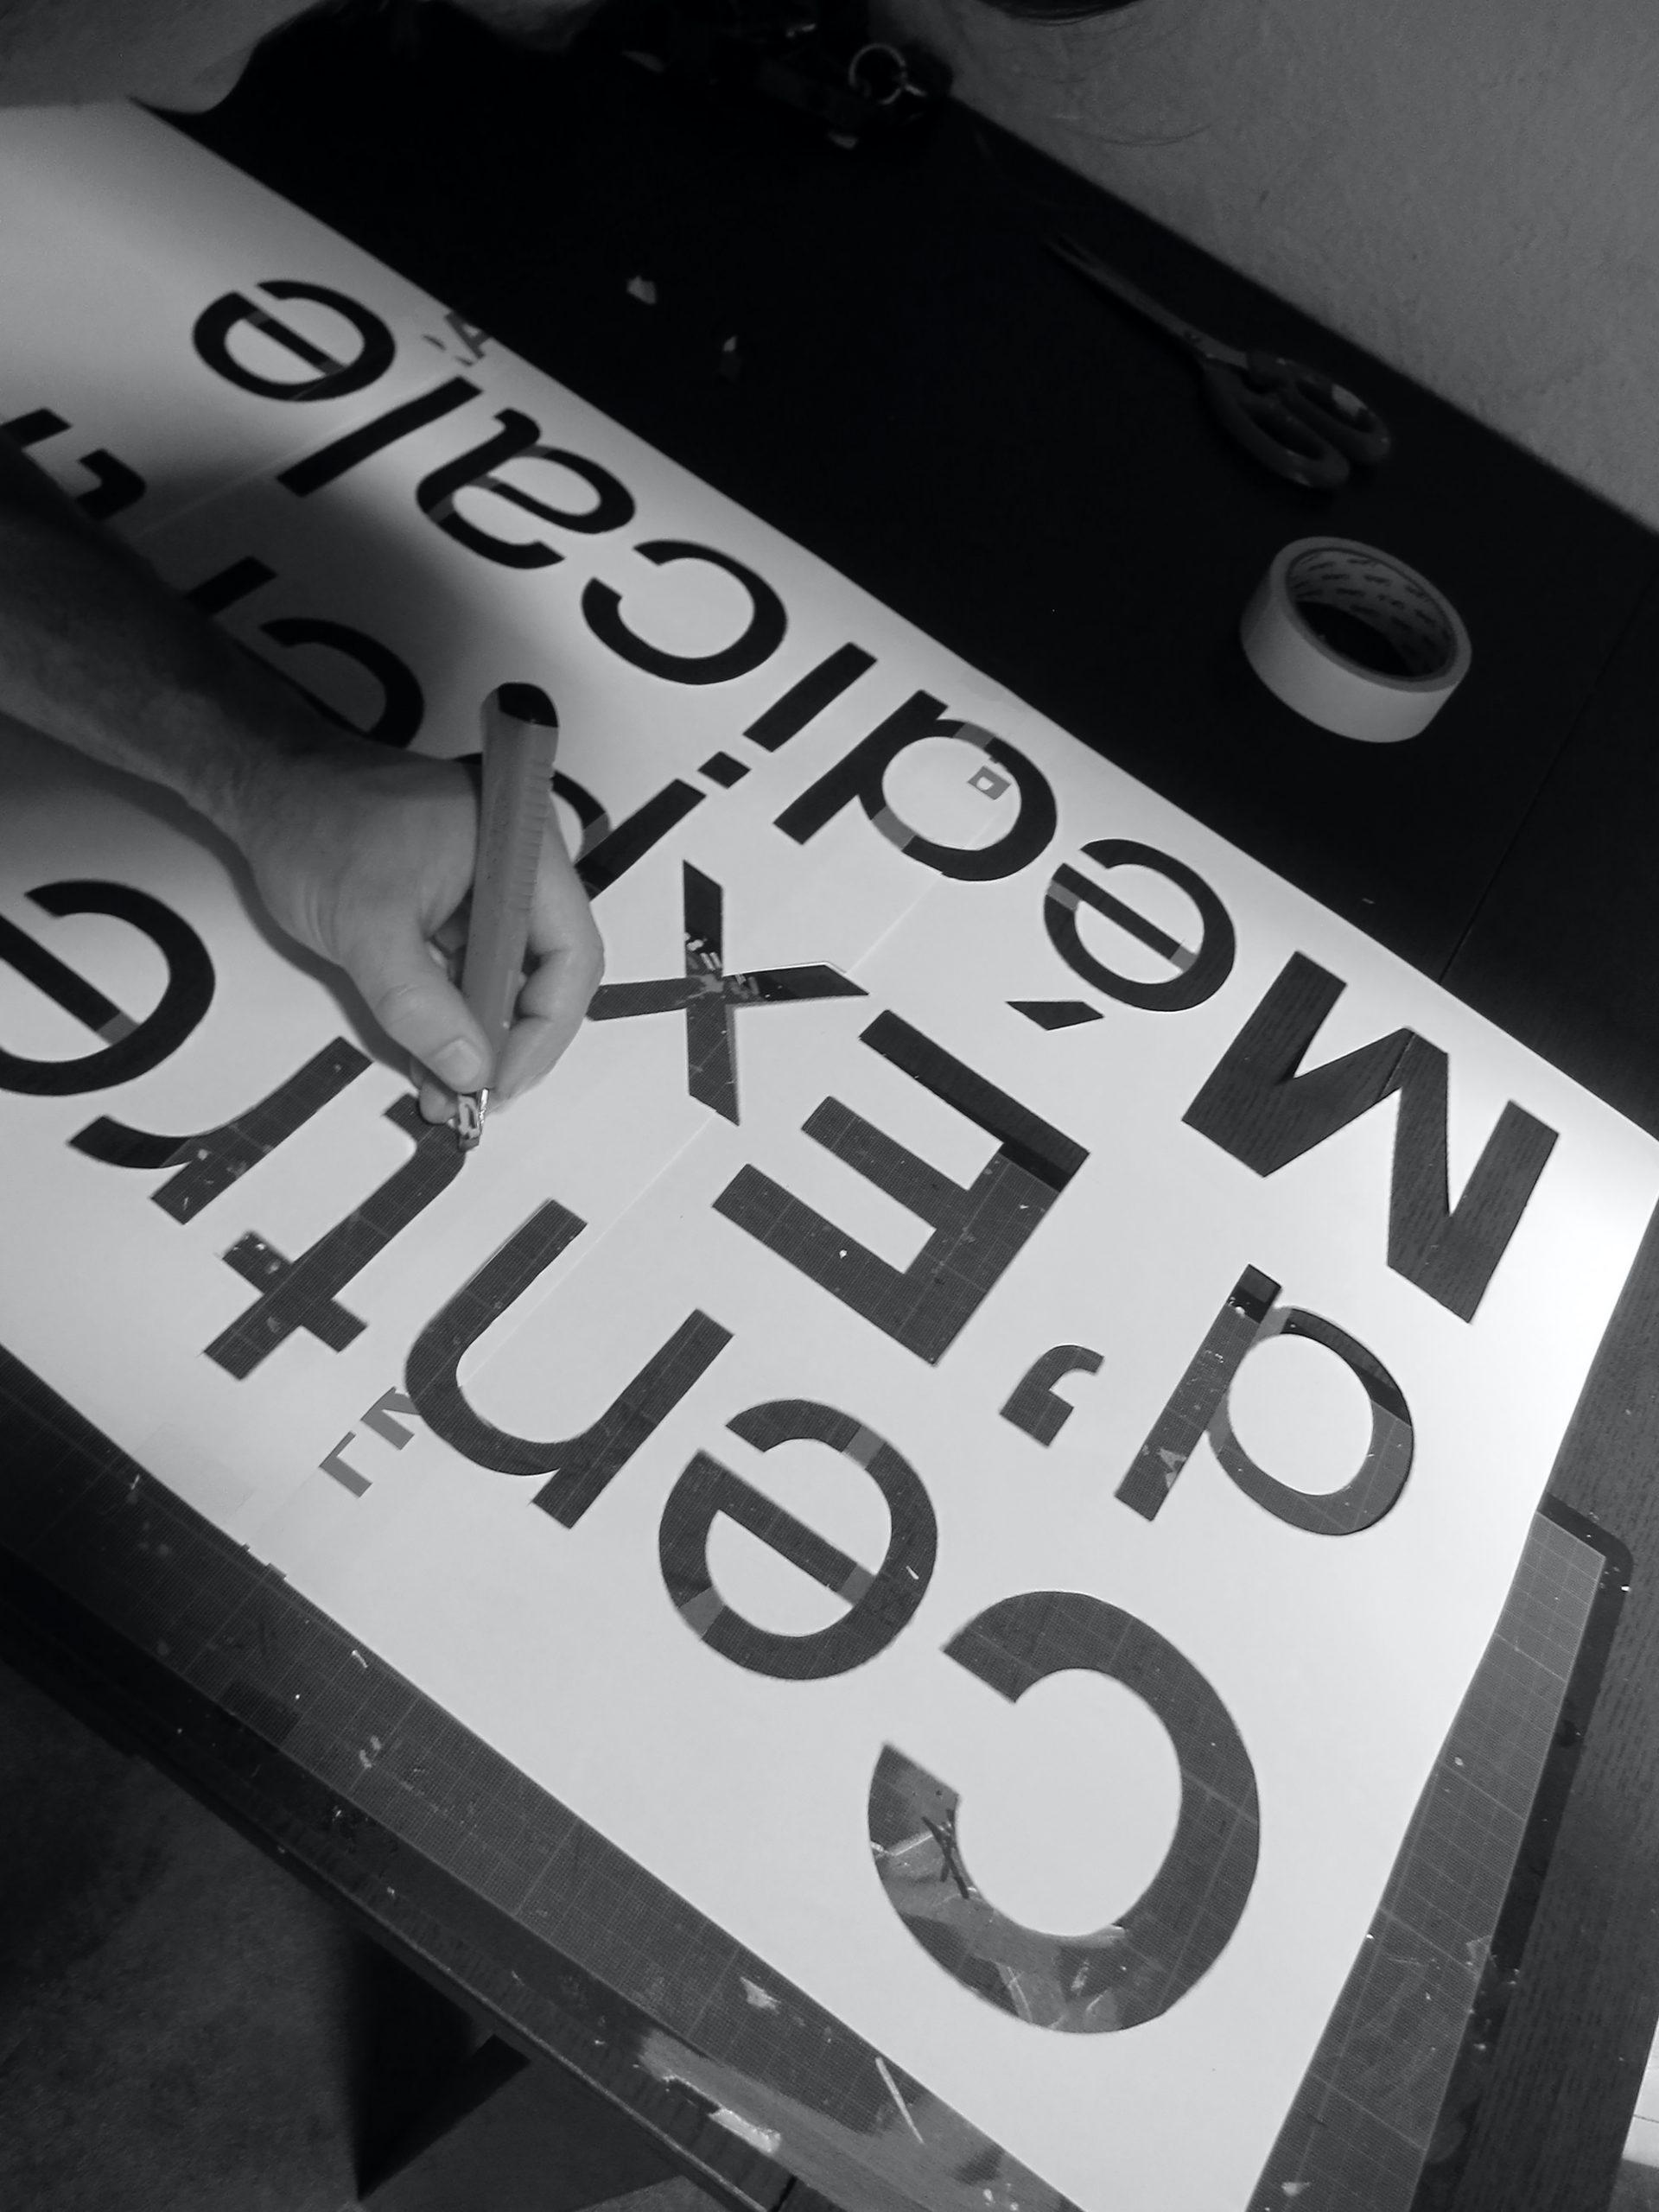 decoration-planete-medical-aeroport-fresque-typographie-pochoir